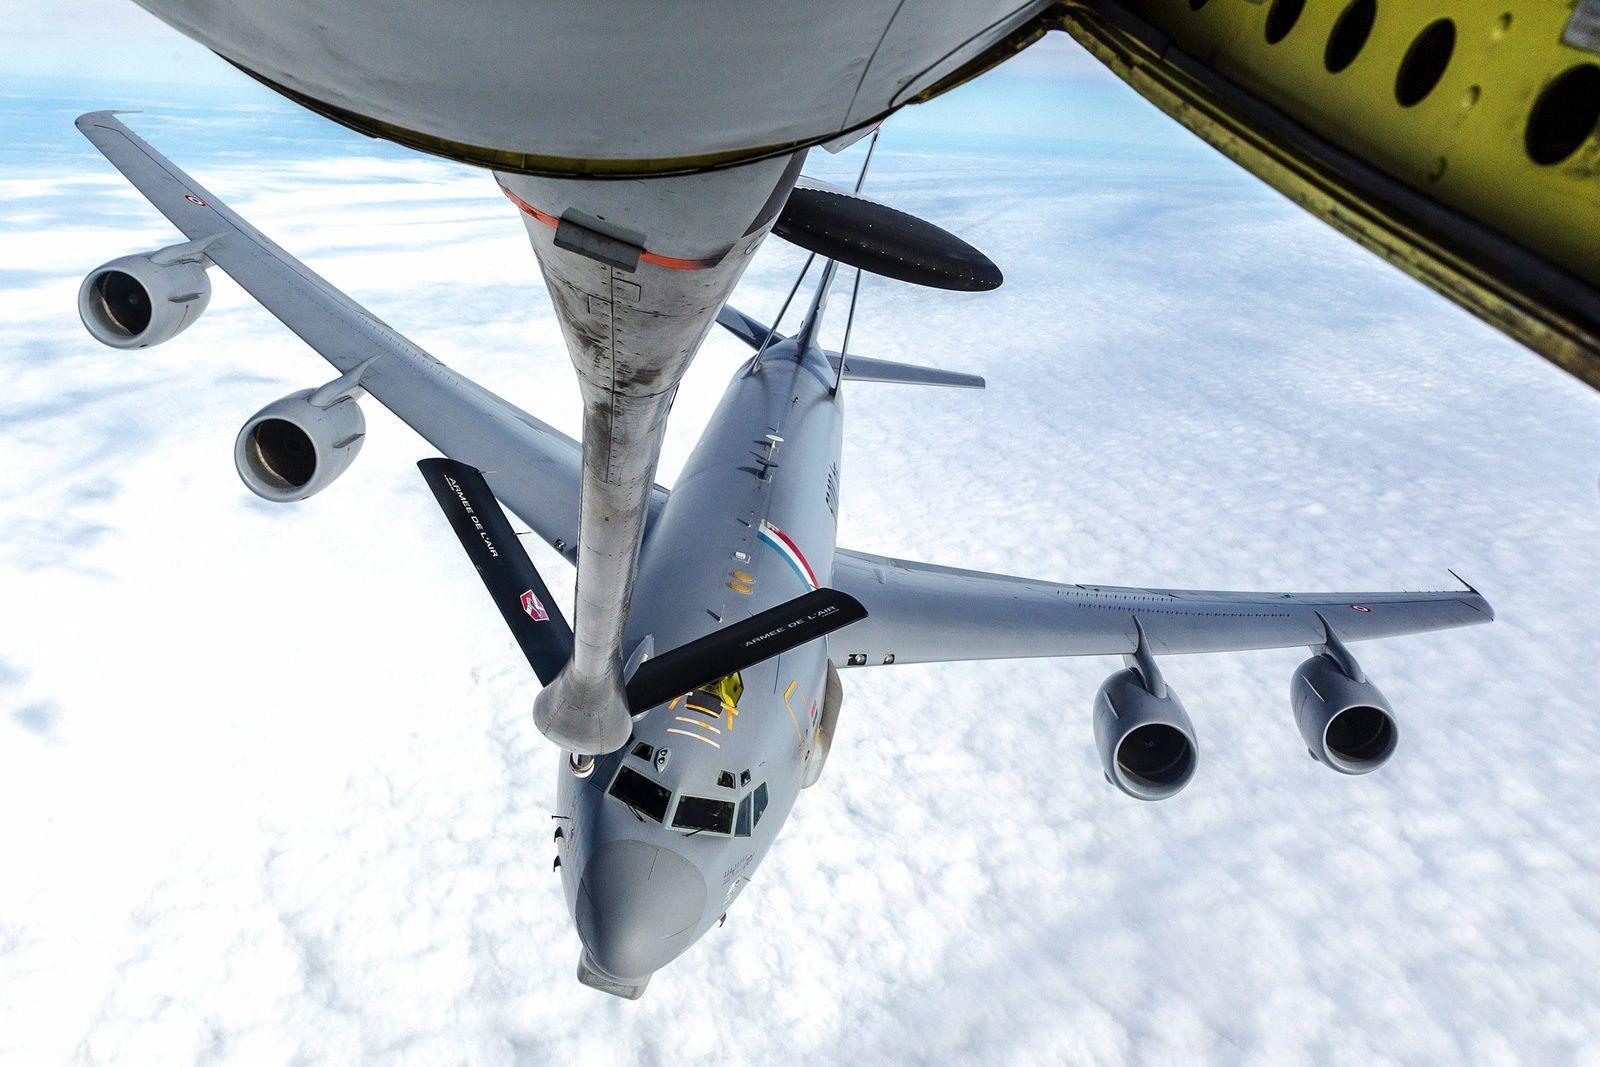 Les E-3F Sentry AWACS de l'Armée de l'Air continuent leurs expérimentations au sol et en vol